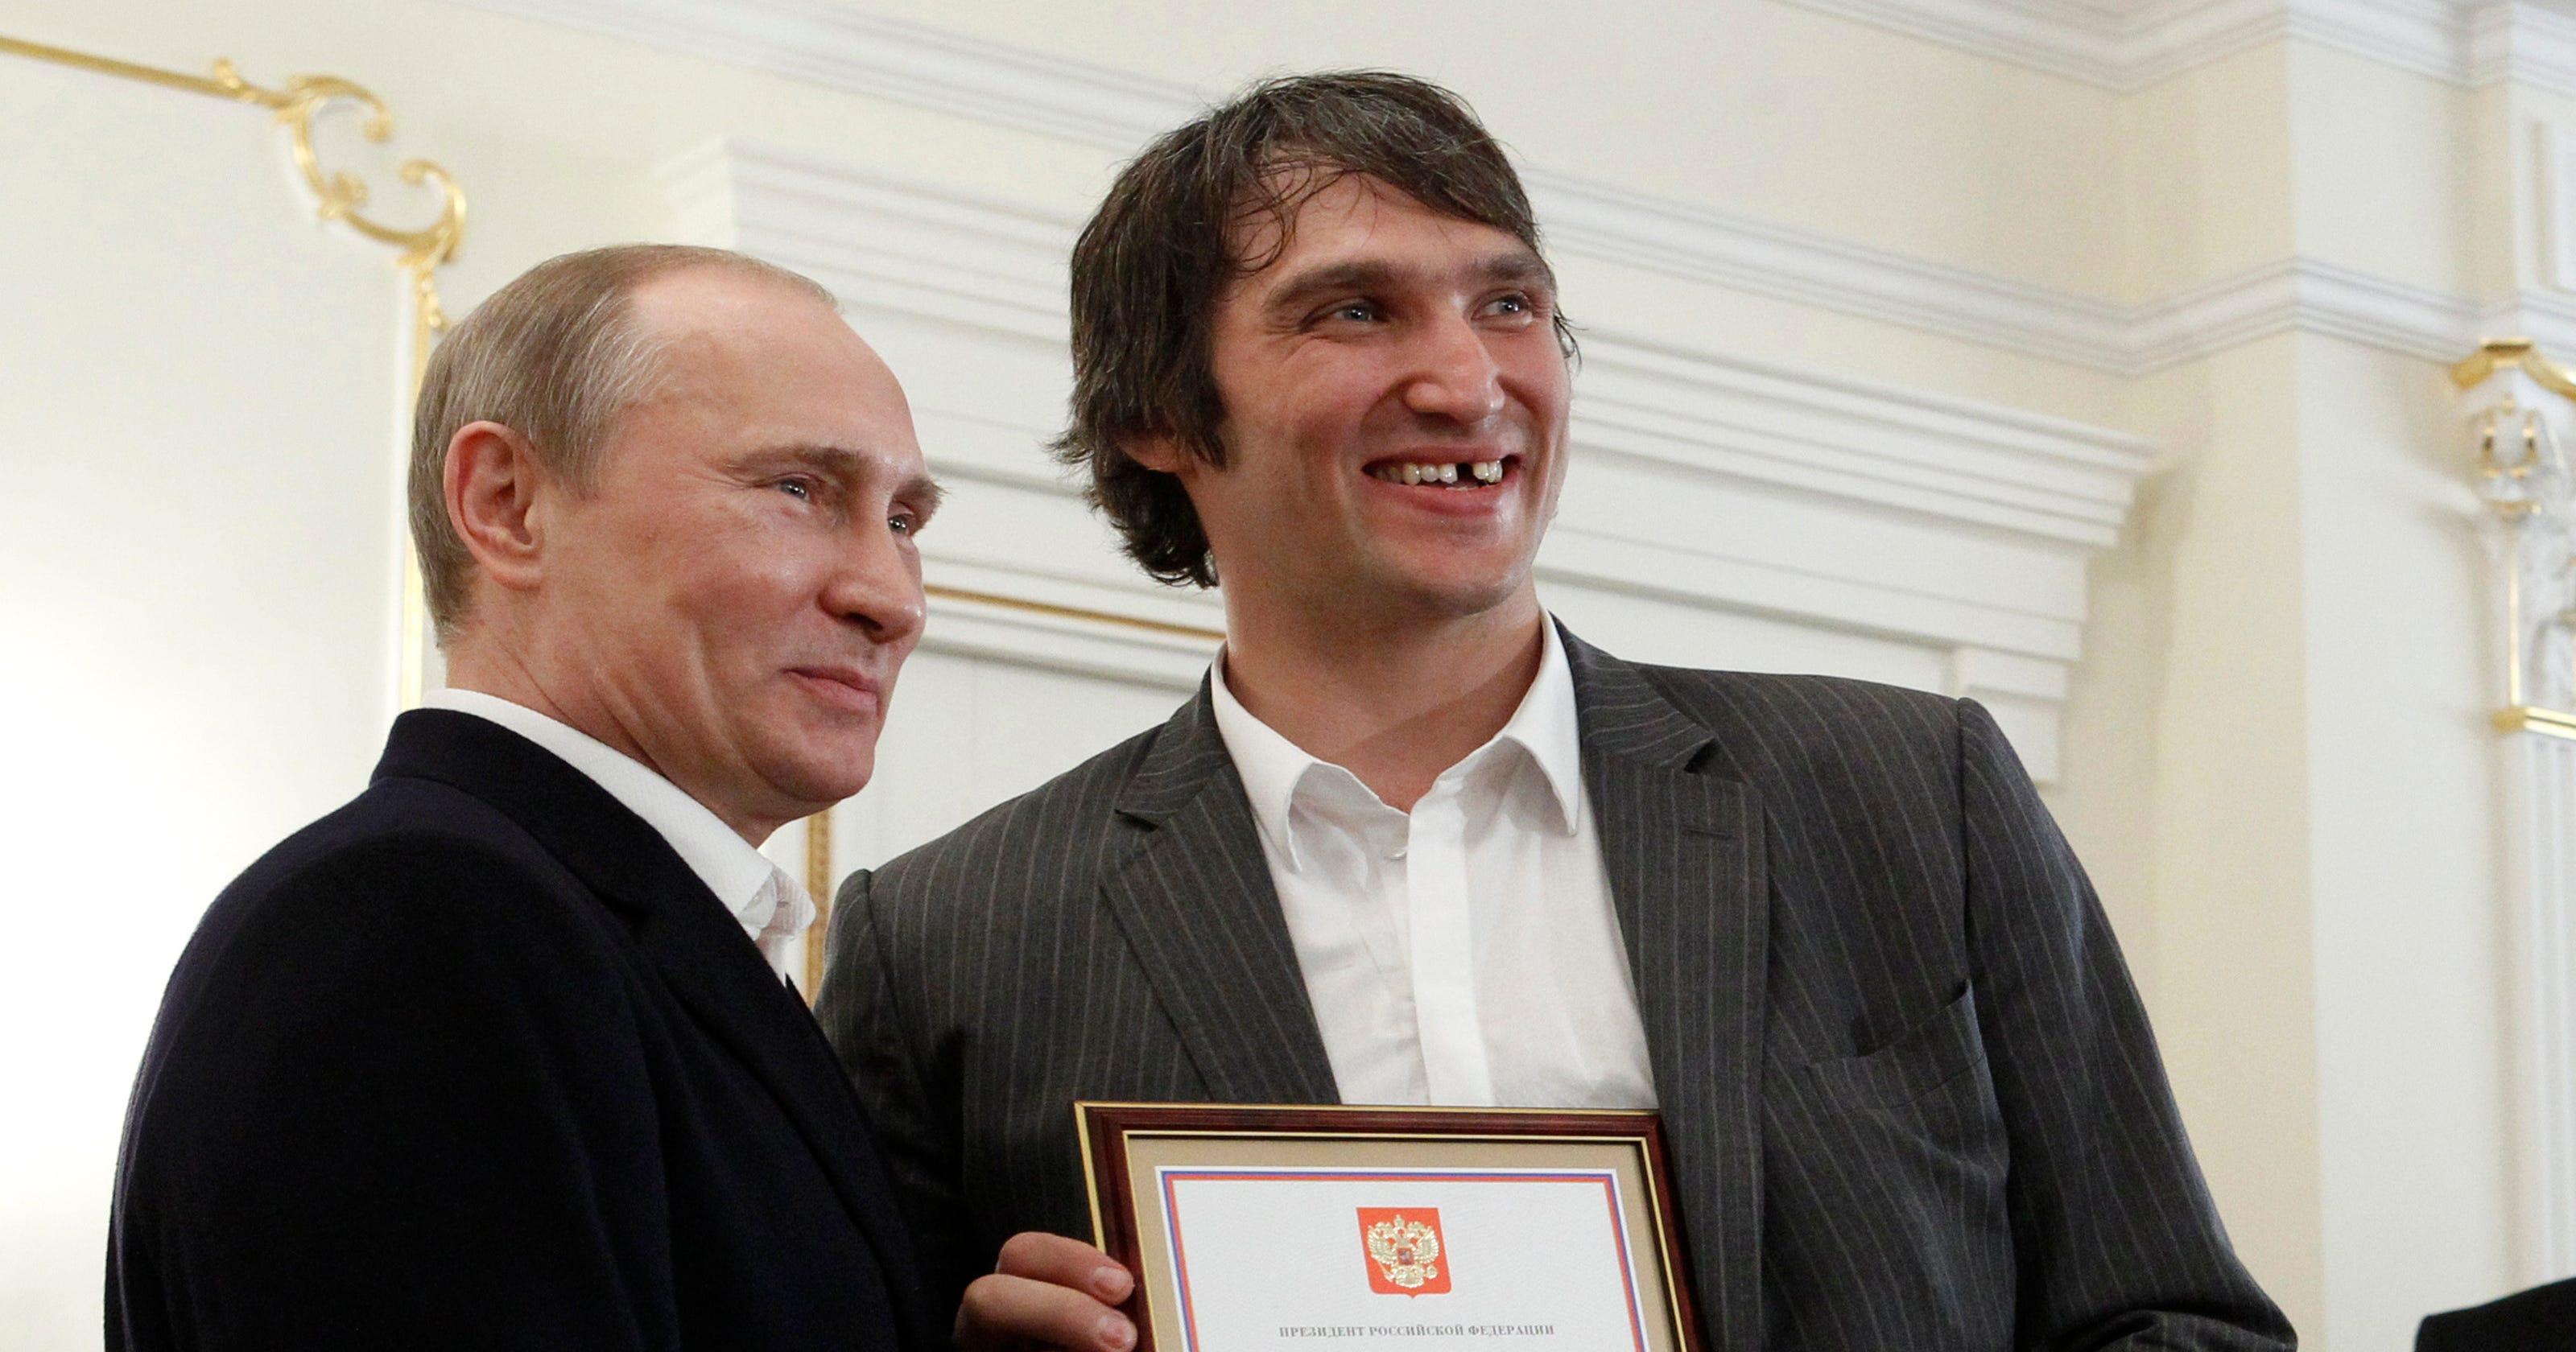 92fd52e34 Capitals' Alex Ovechkin voices support for Vladimir Putin